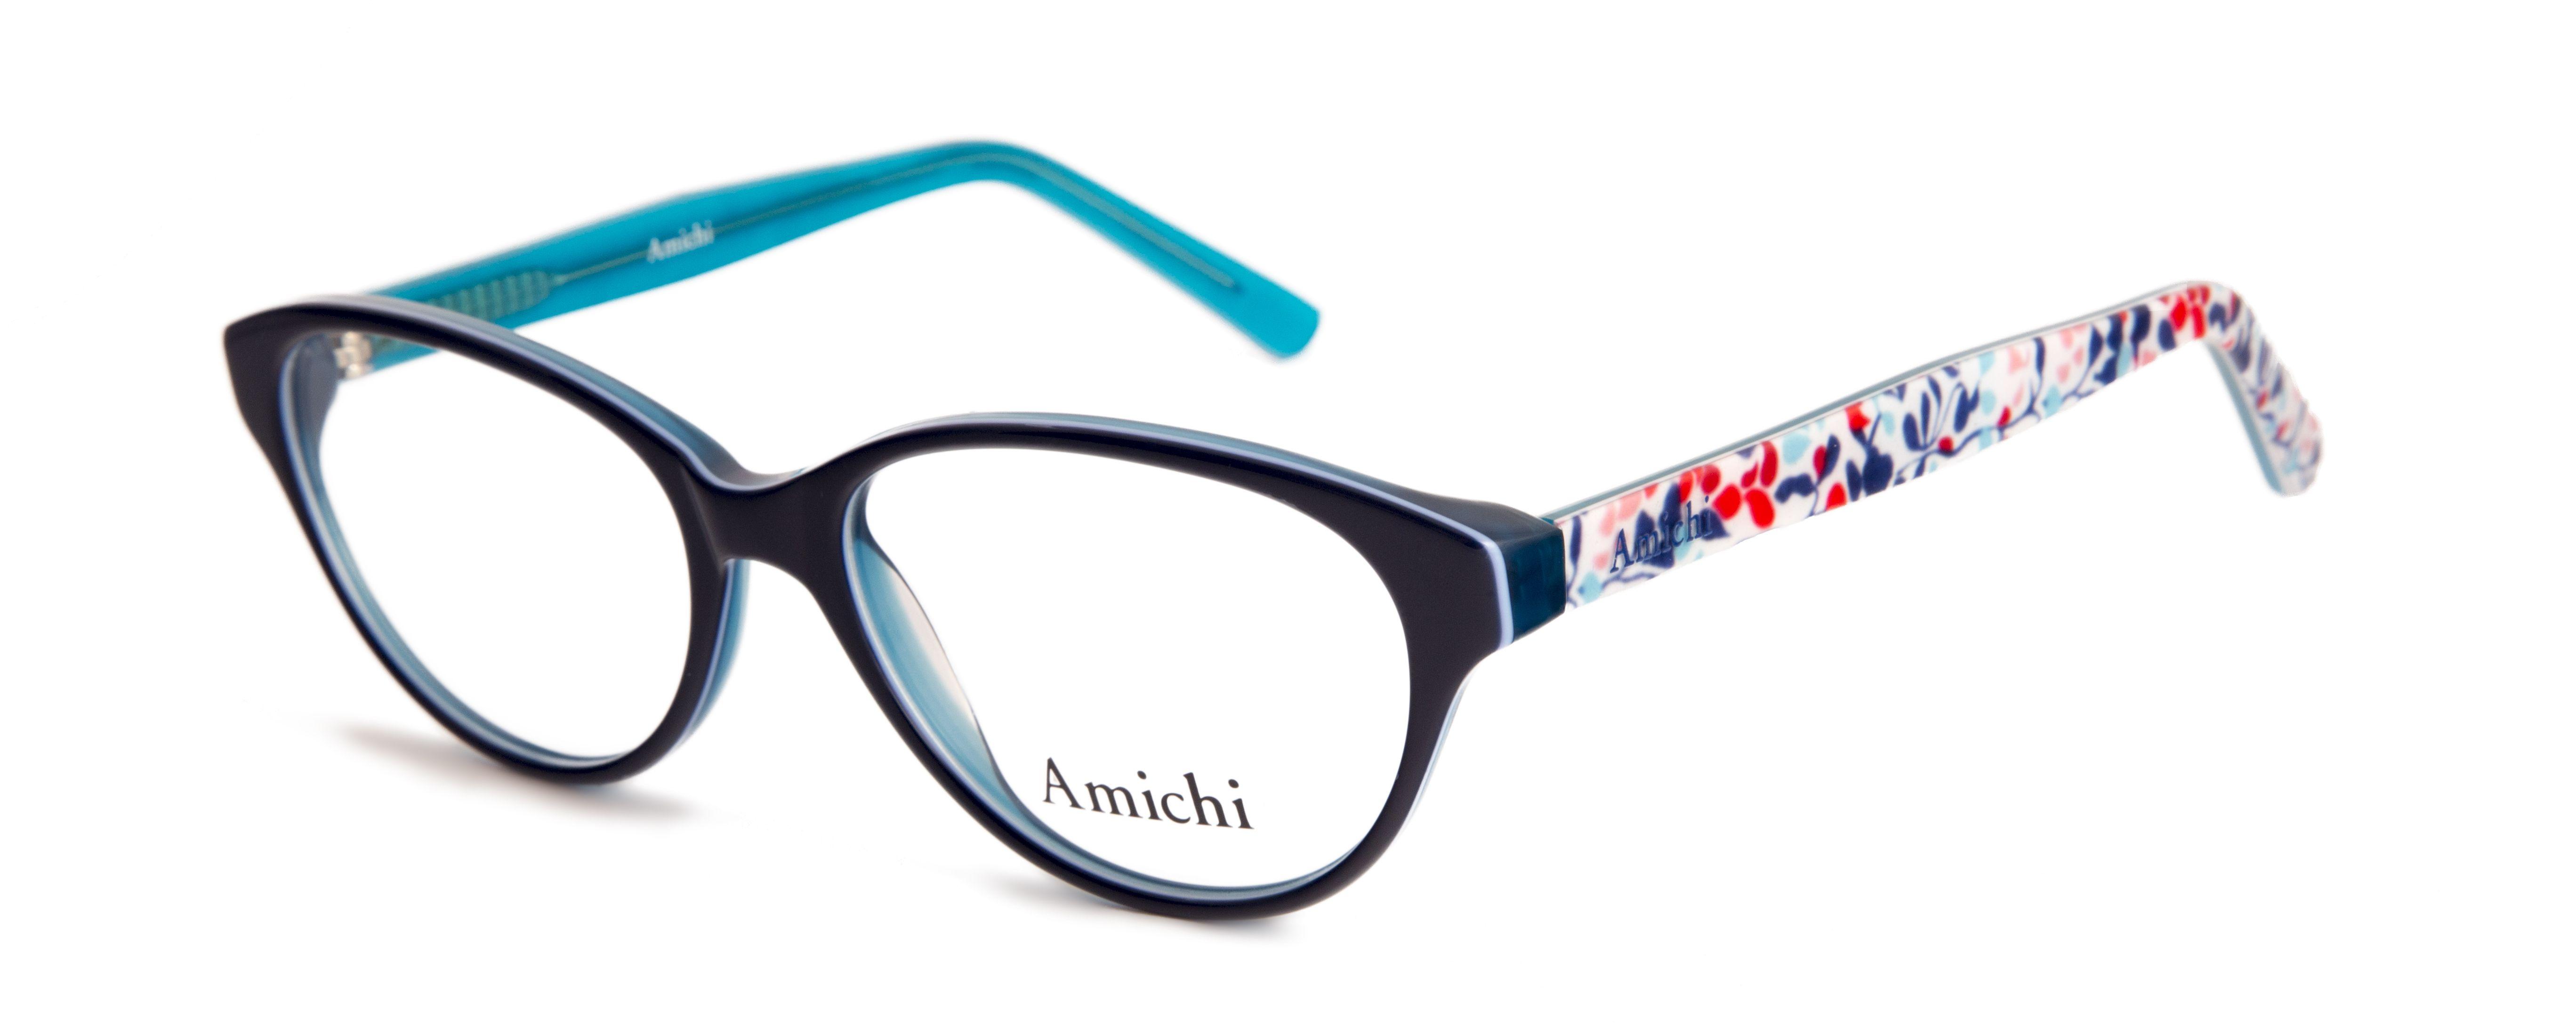 Gafas Amichi para Opticalia. Montura de pasta en color negro con ...